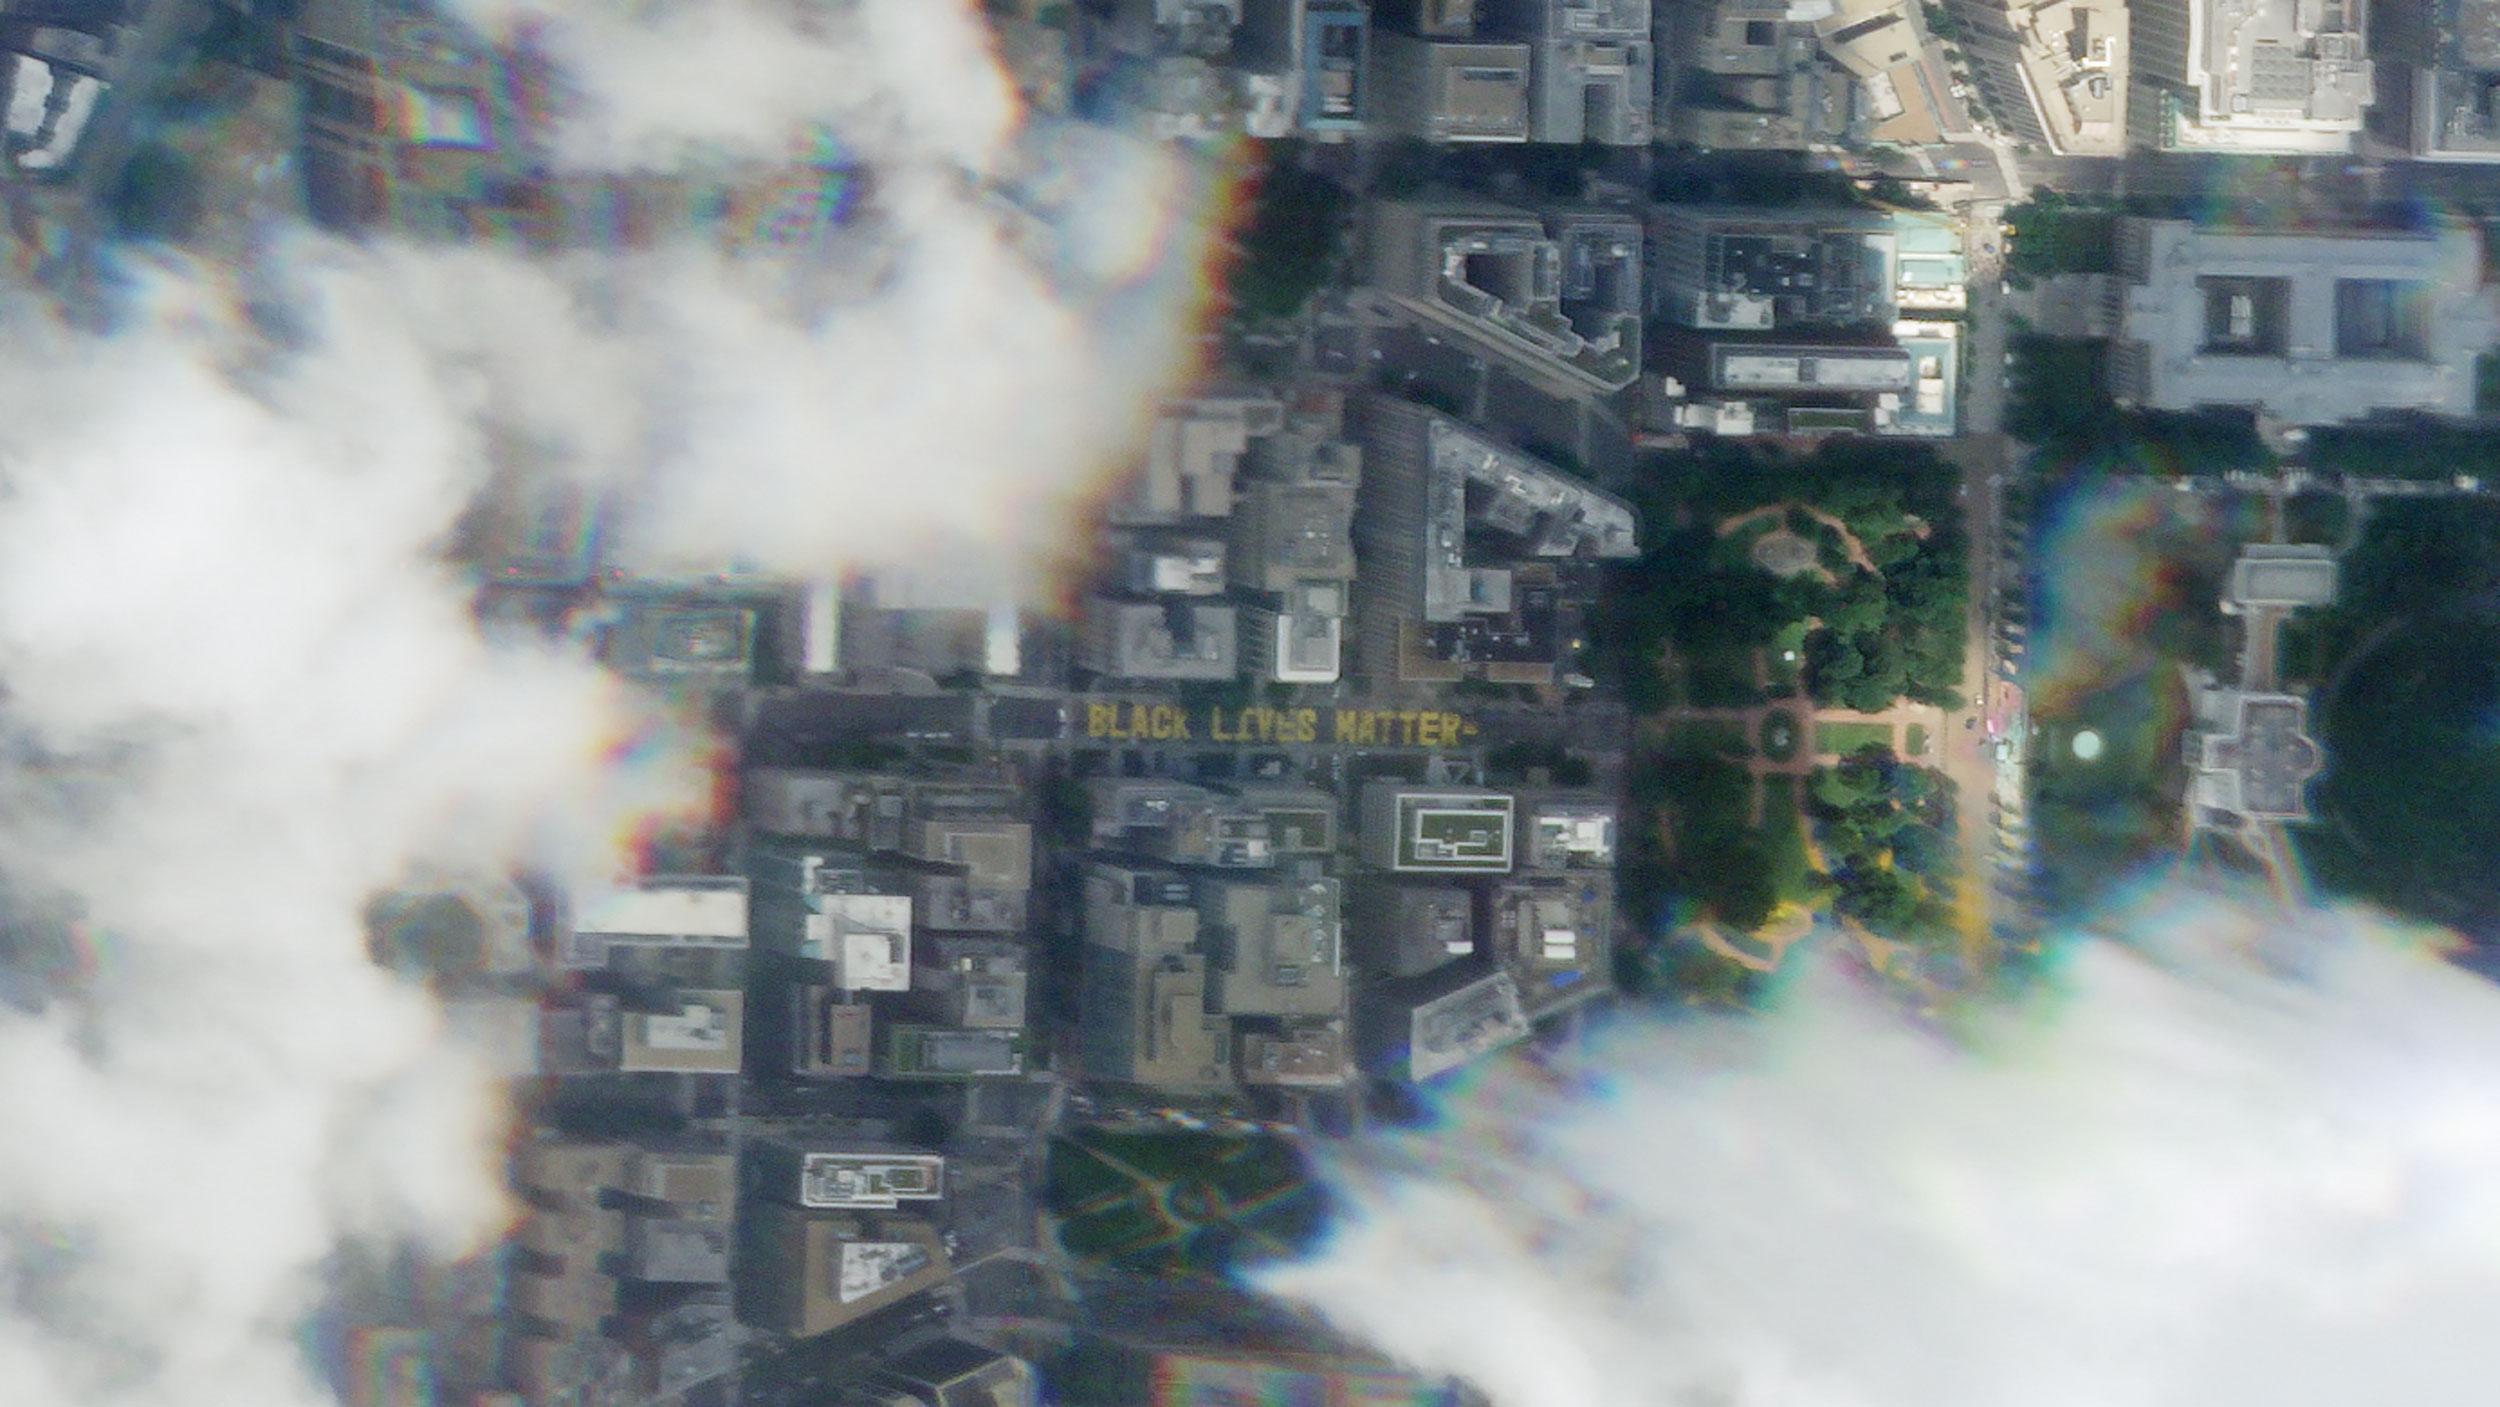 Washington's new Black Lives Matter street mural is captured in satellite image